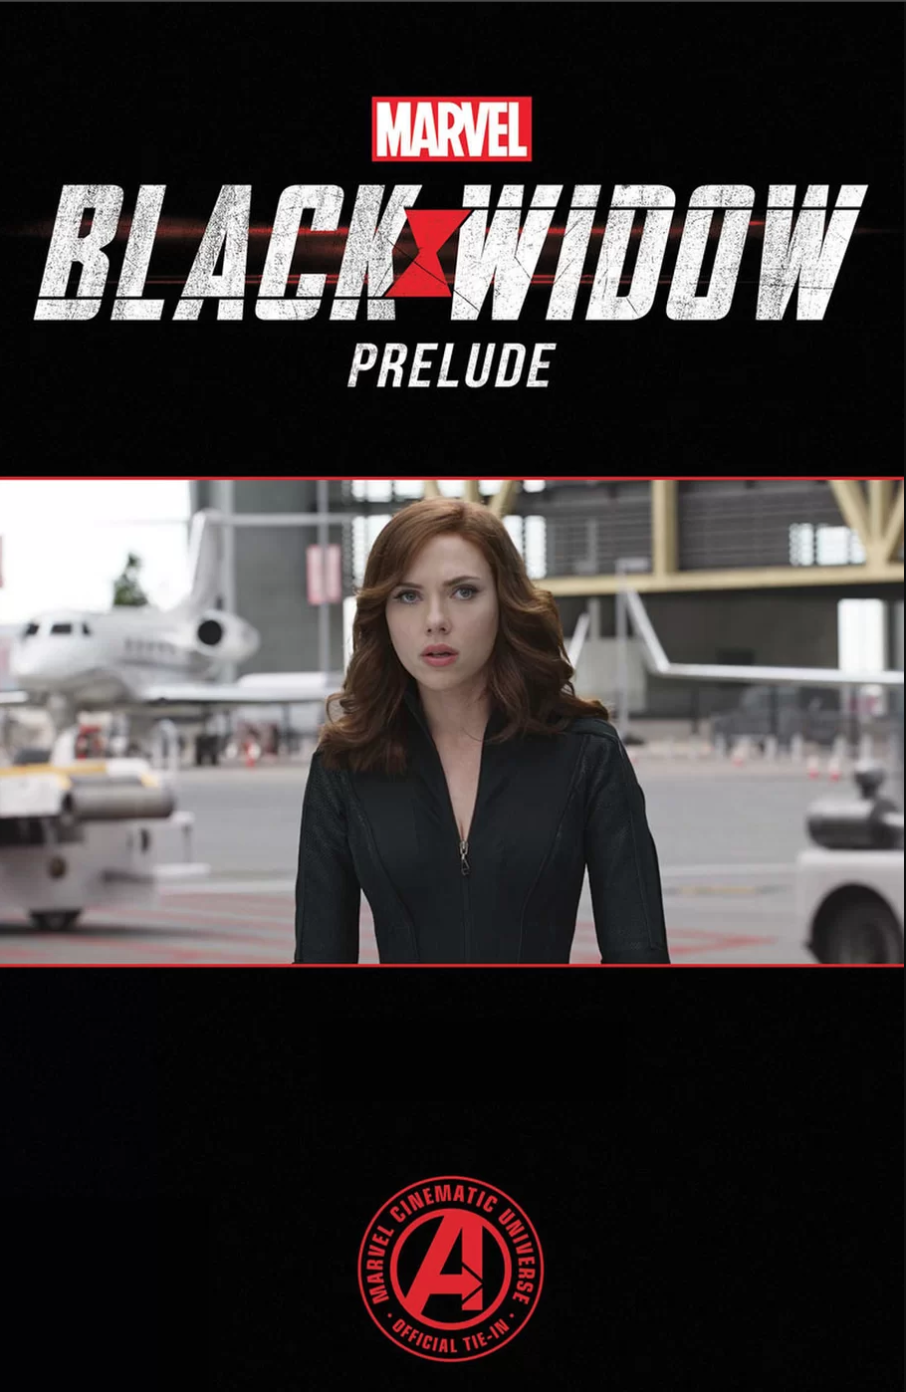 Black Widow Prelude